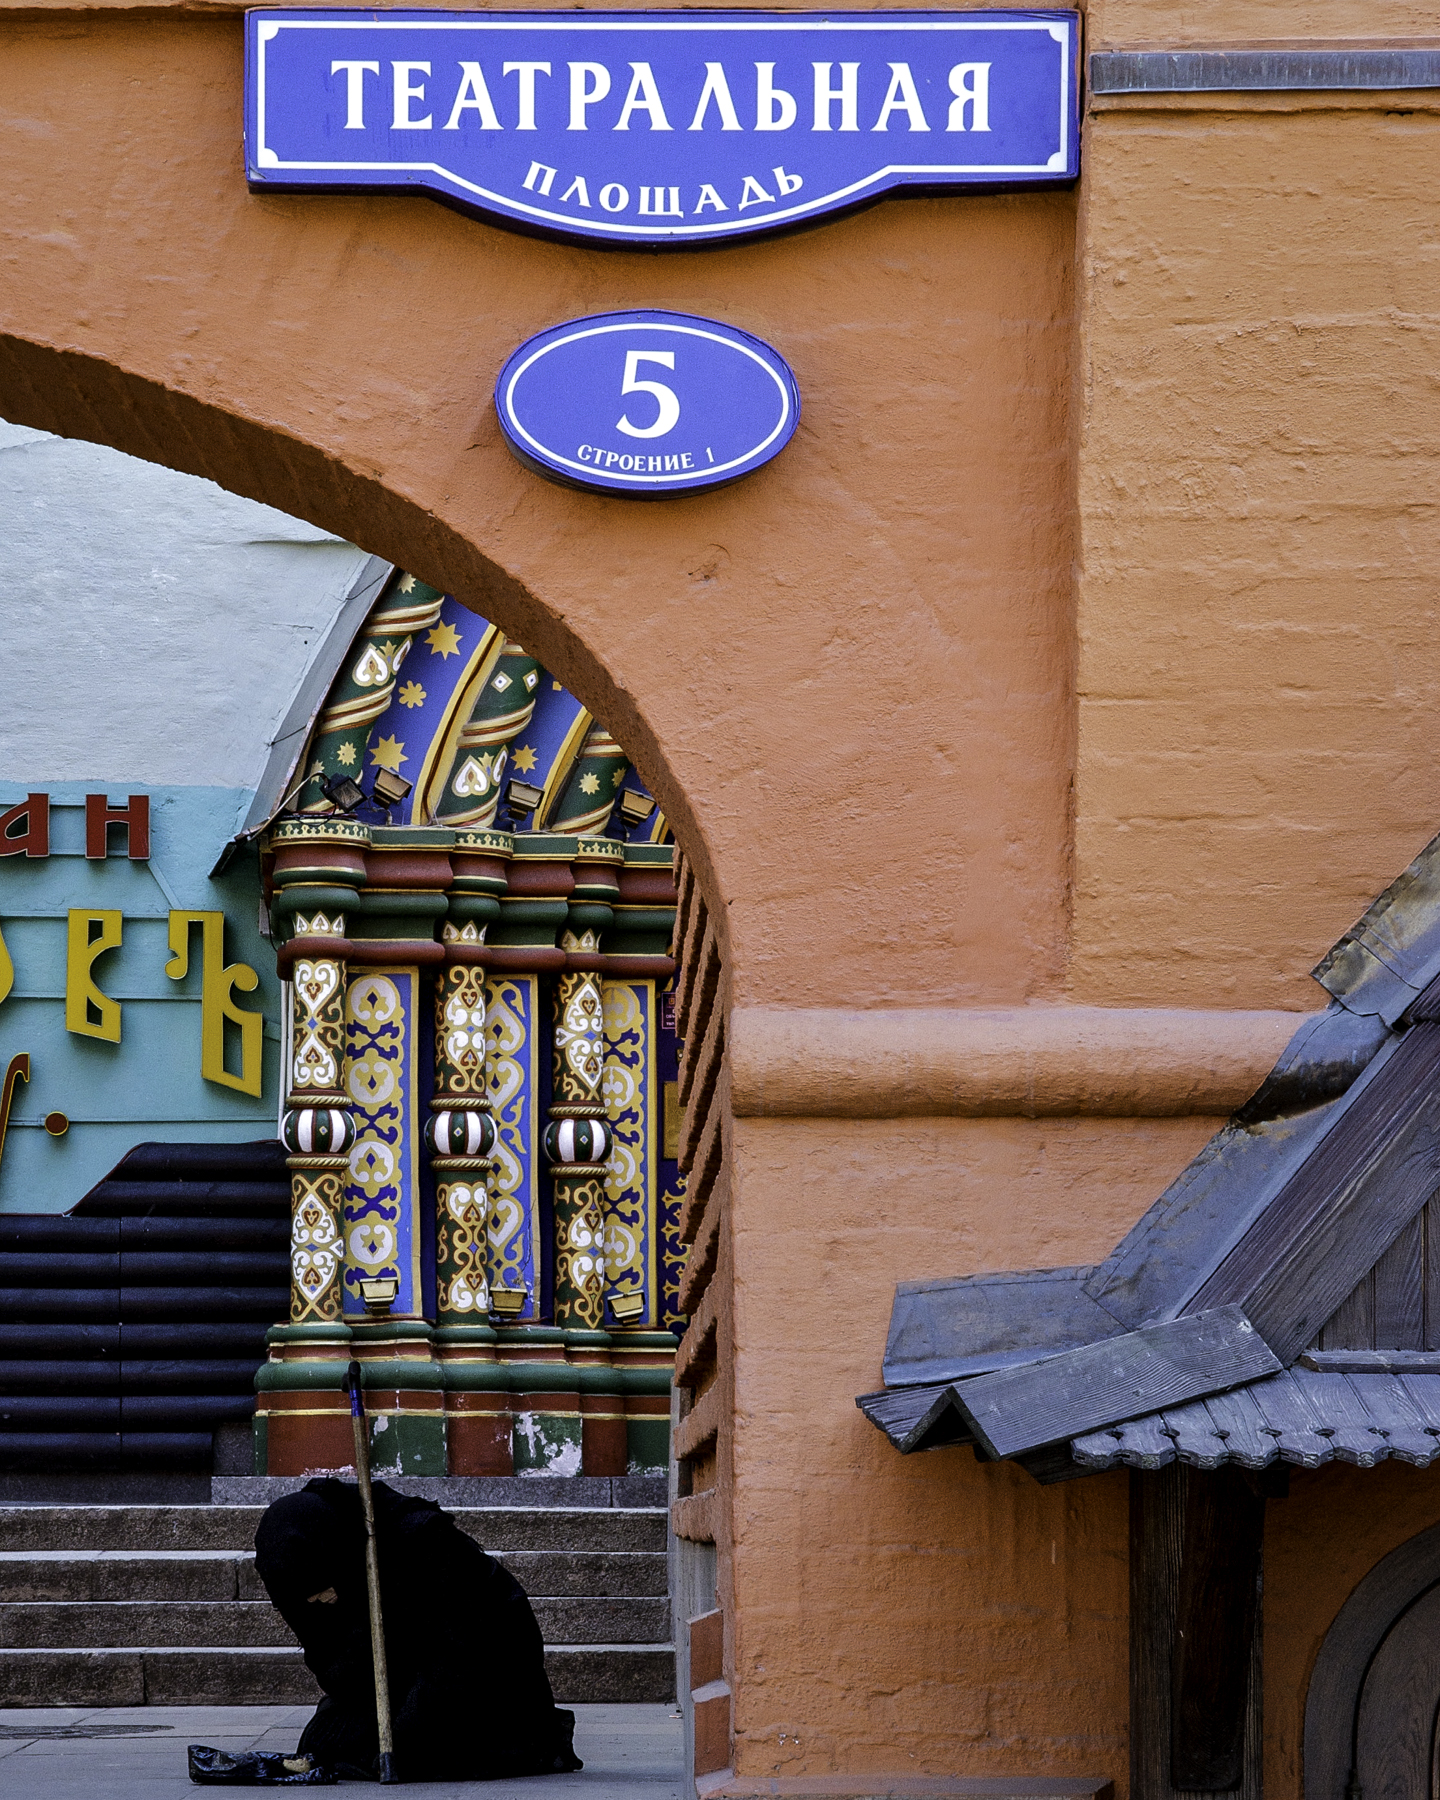 Teatralnaya Ploshad, Theatre Square